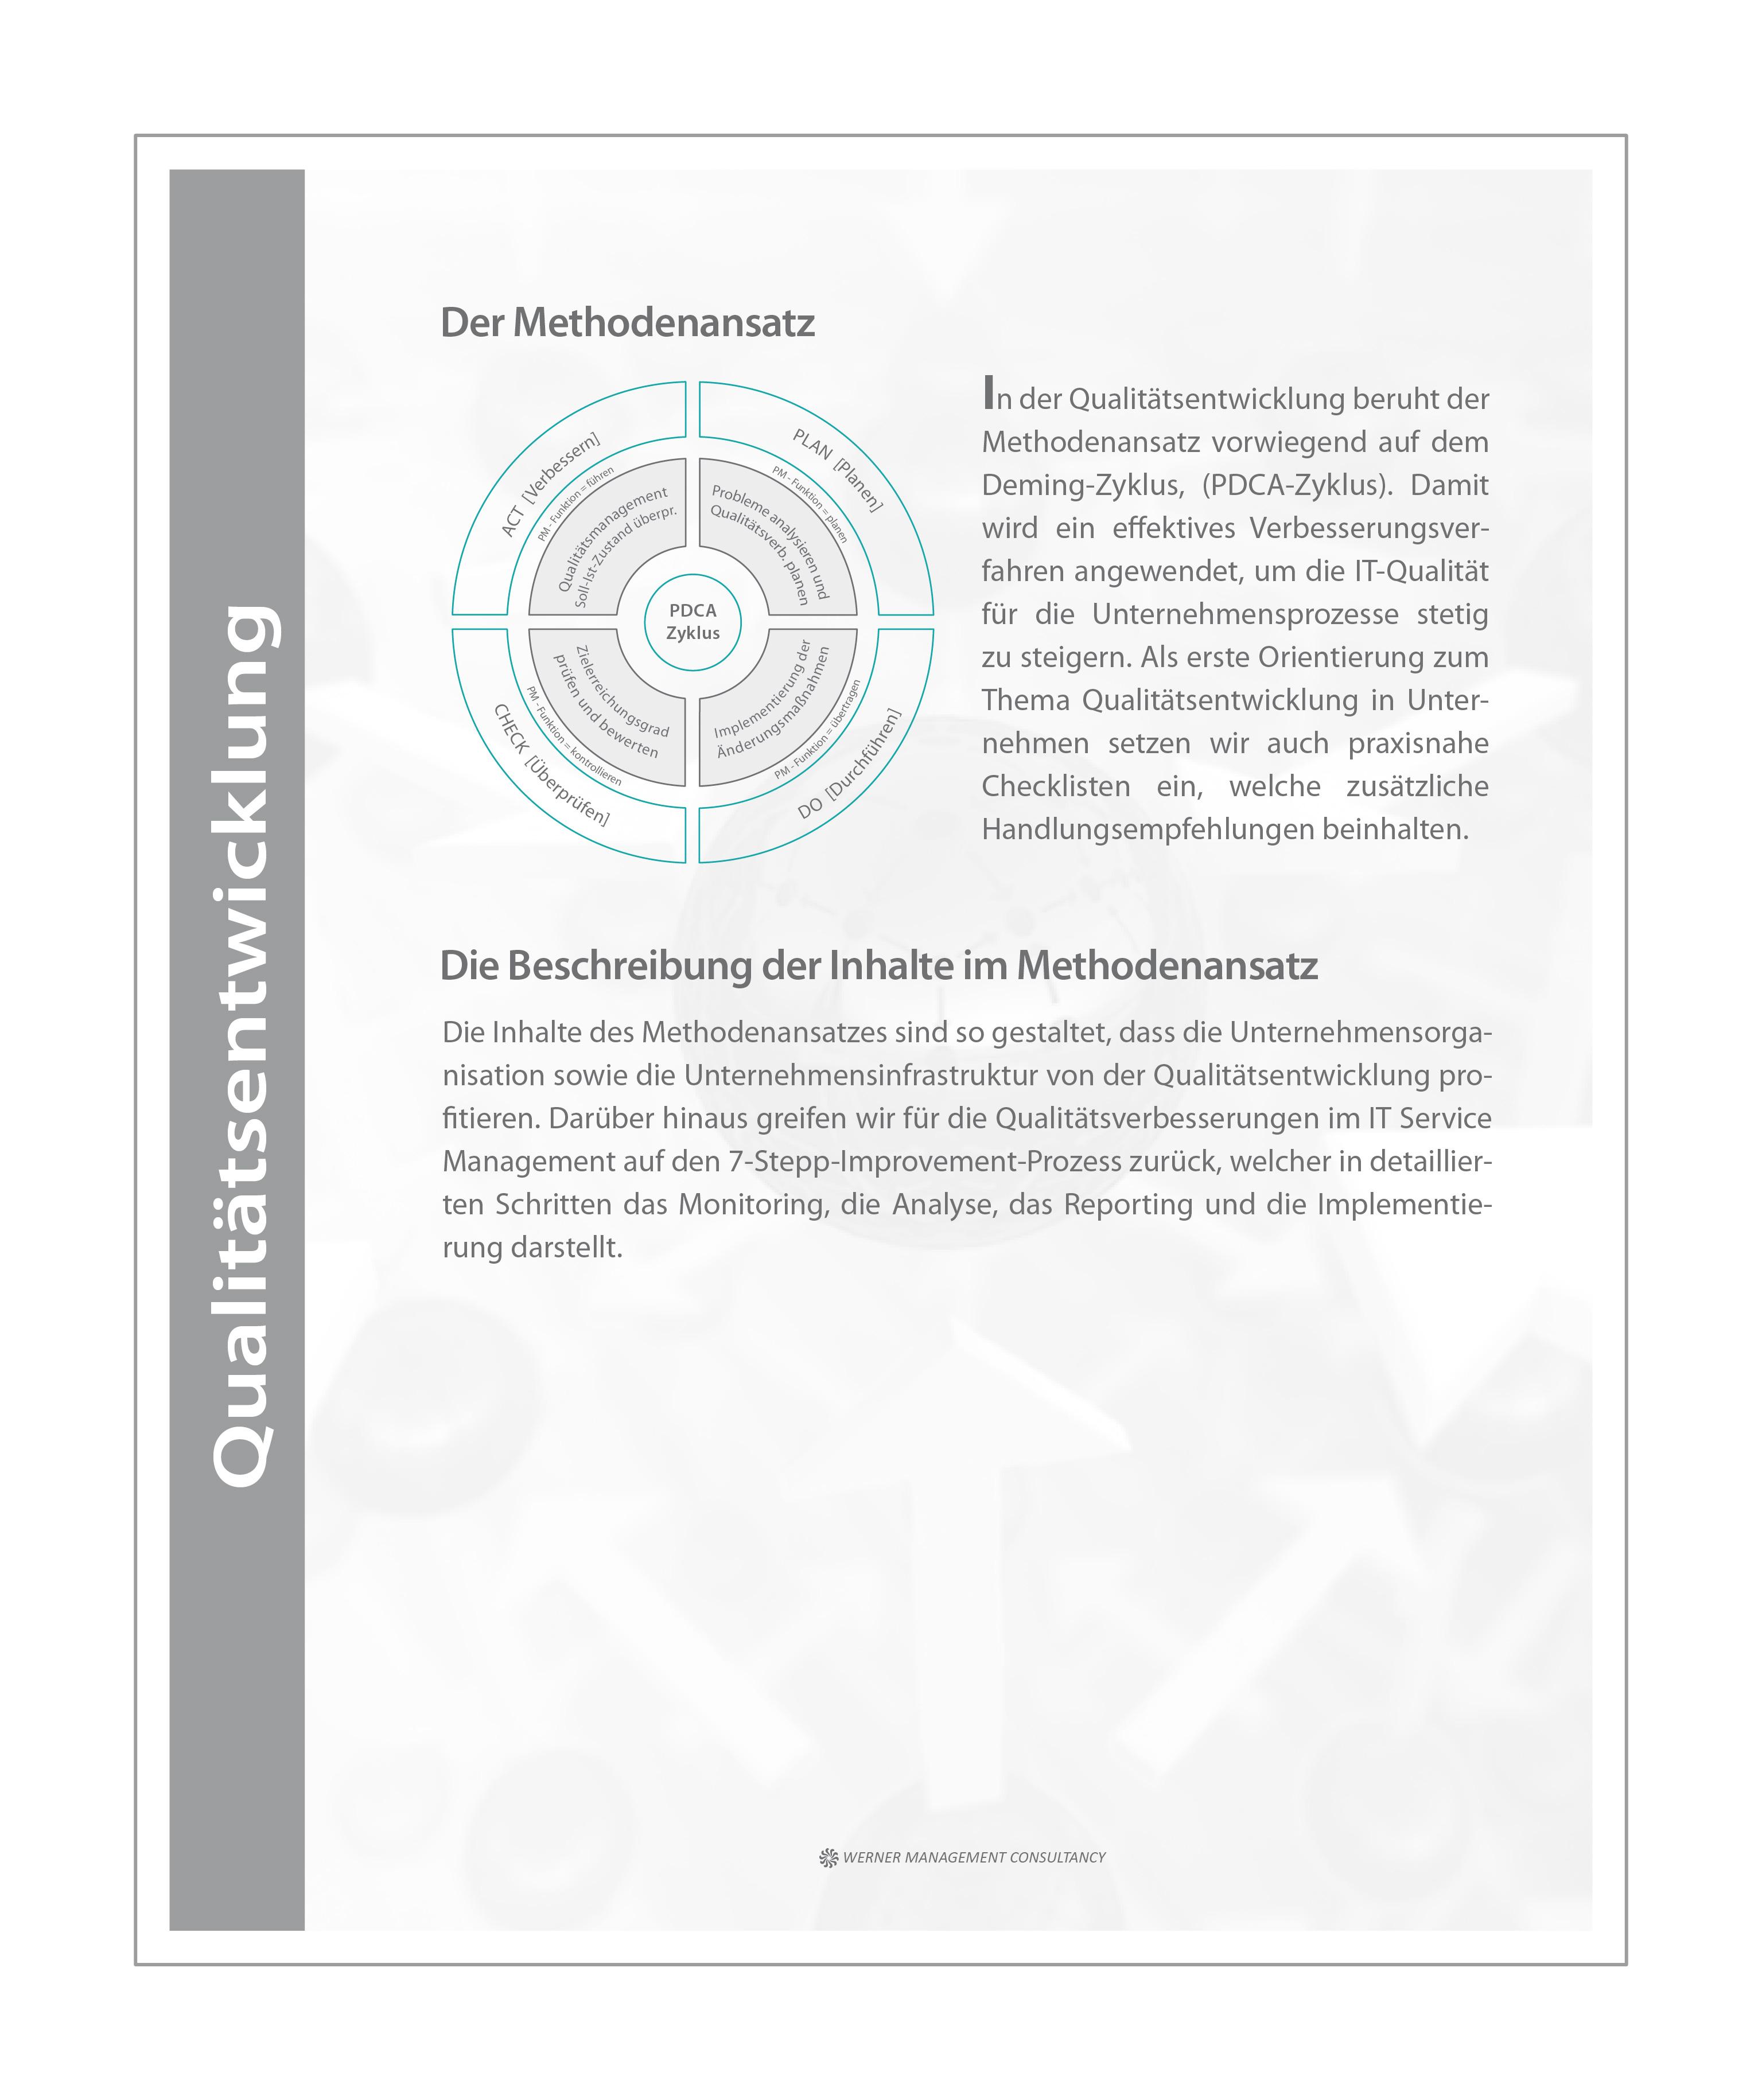 WMC Broschüre Business Development Phase-6 Methode